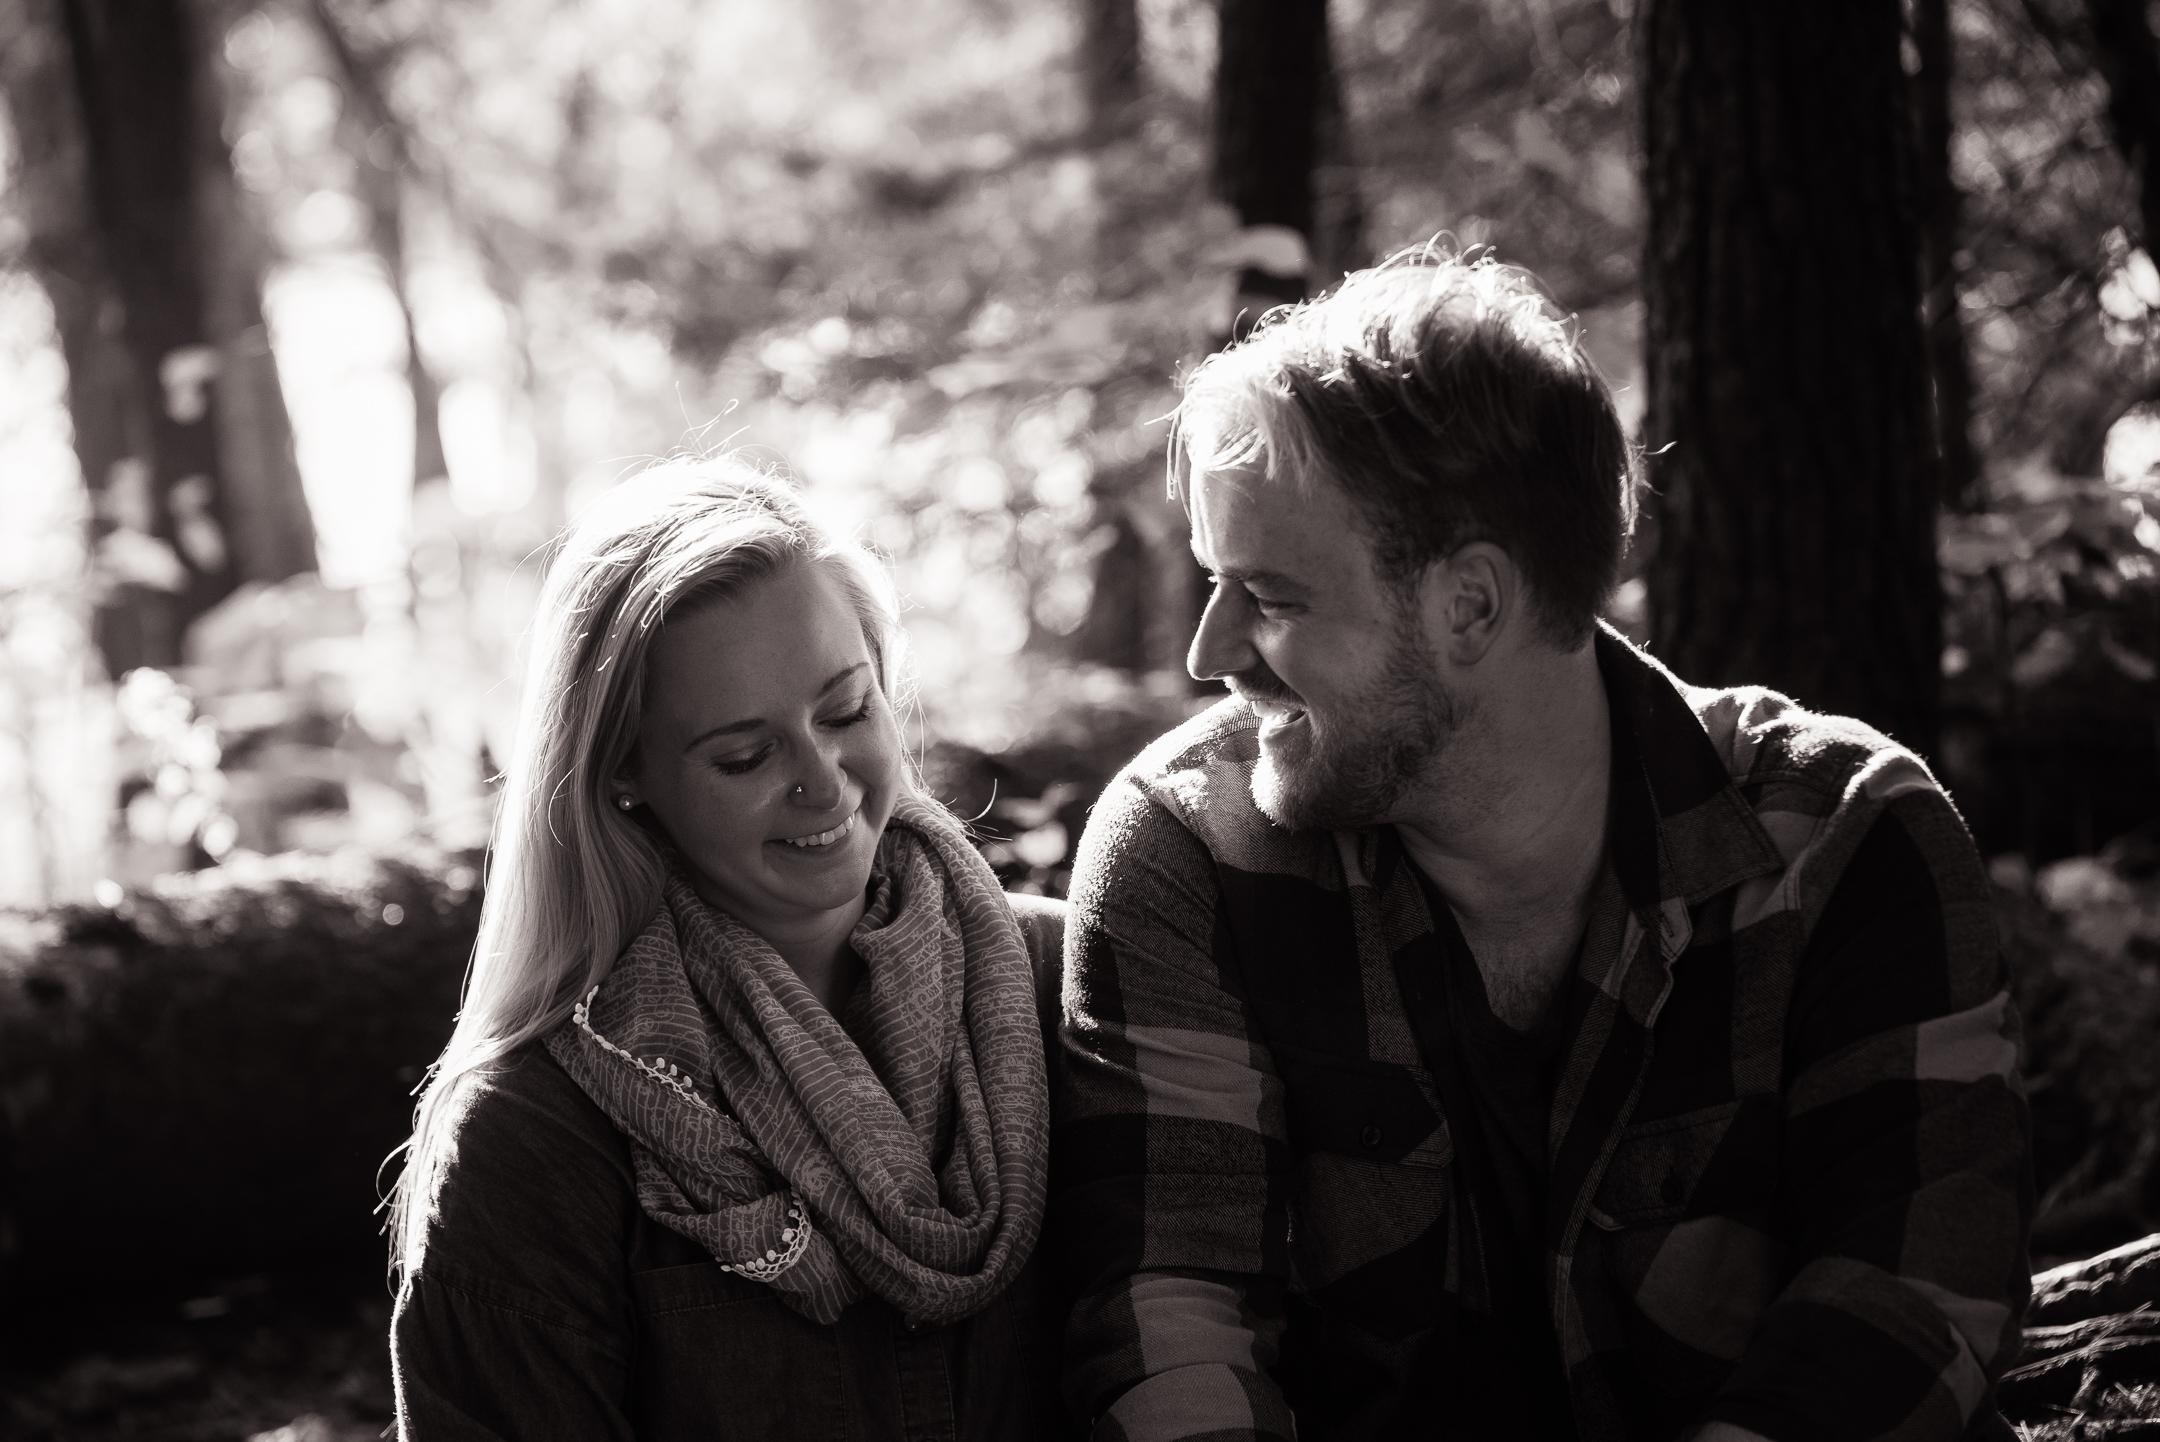 Naomi Lucienne Photography - Couples - 170923191.jpg